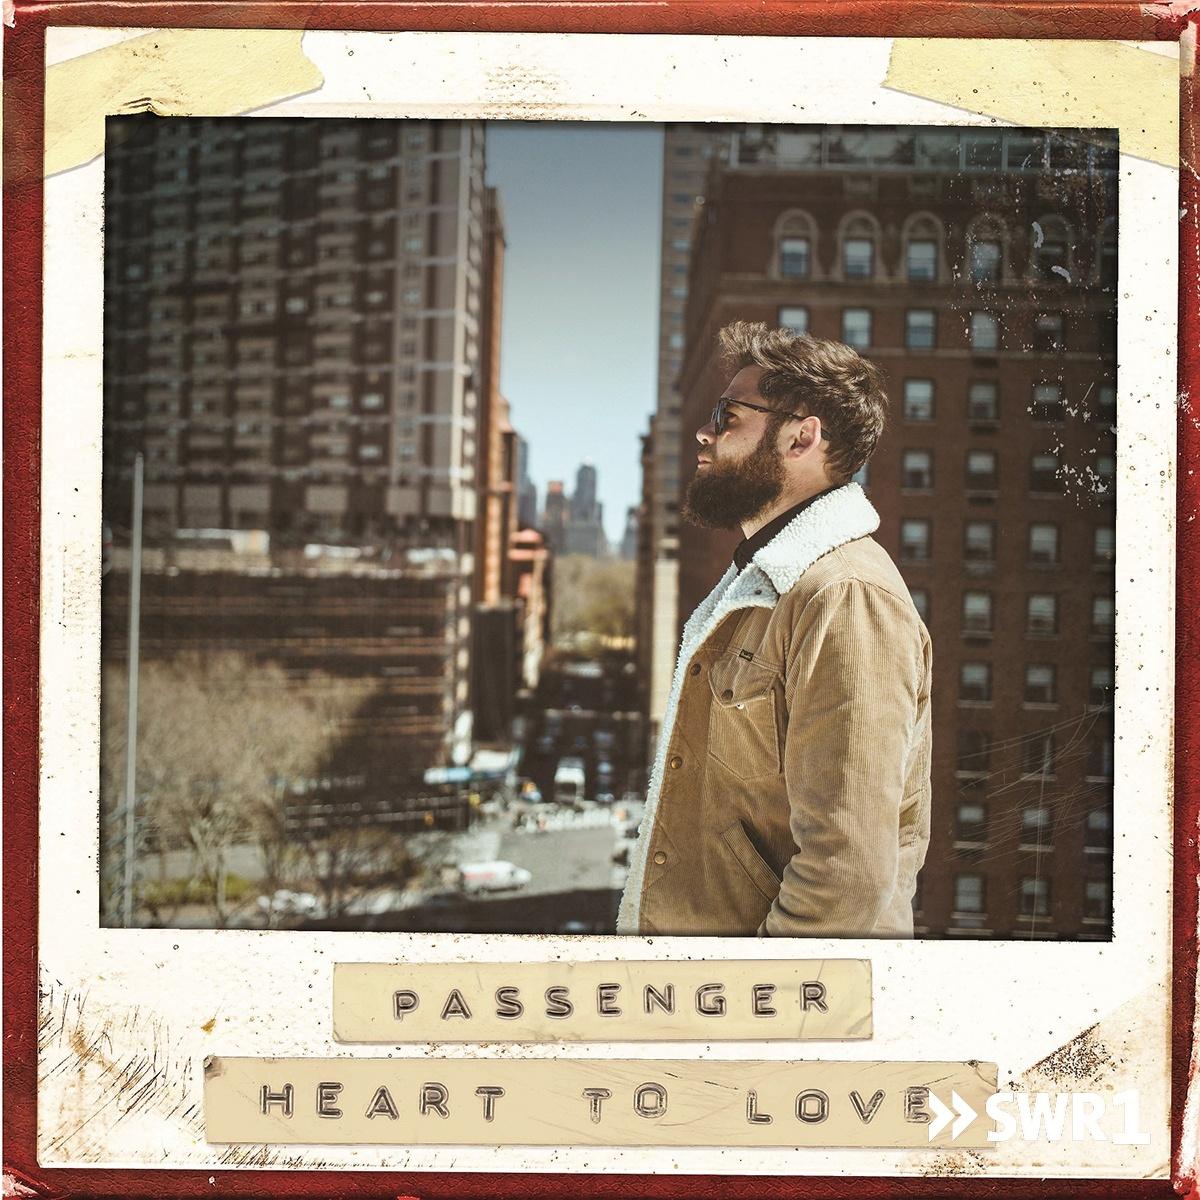 Heart to love (Foto: Passenger)